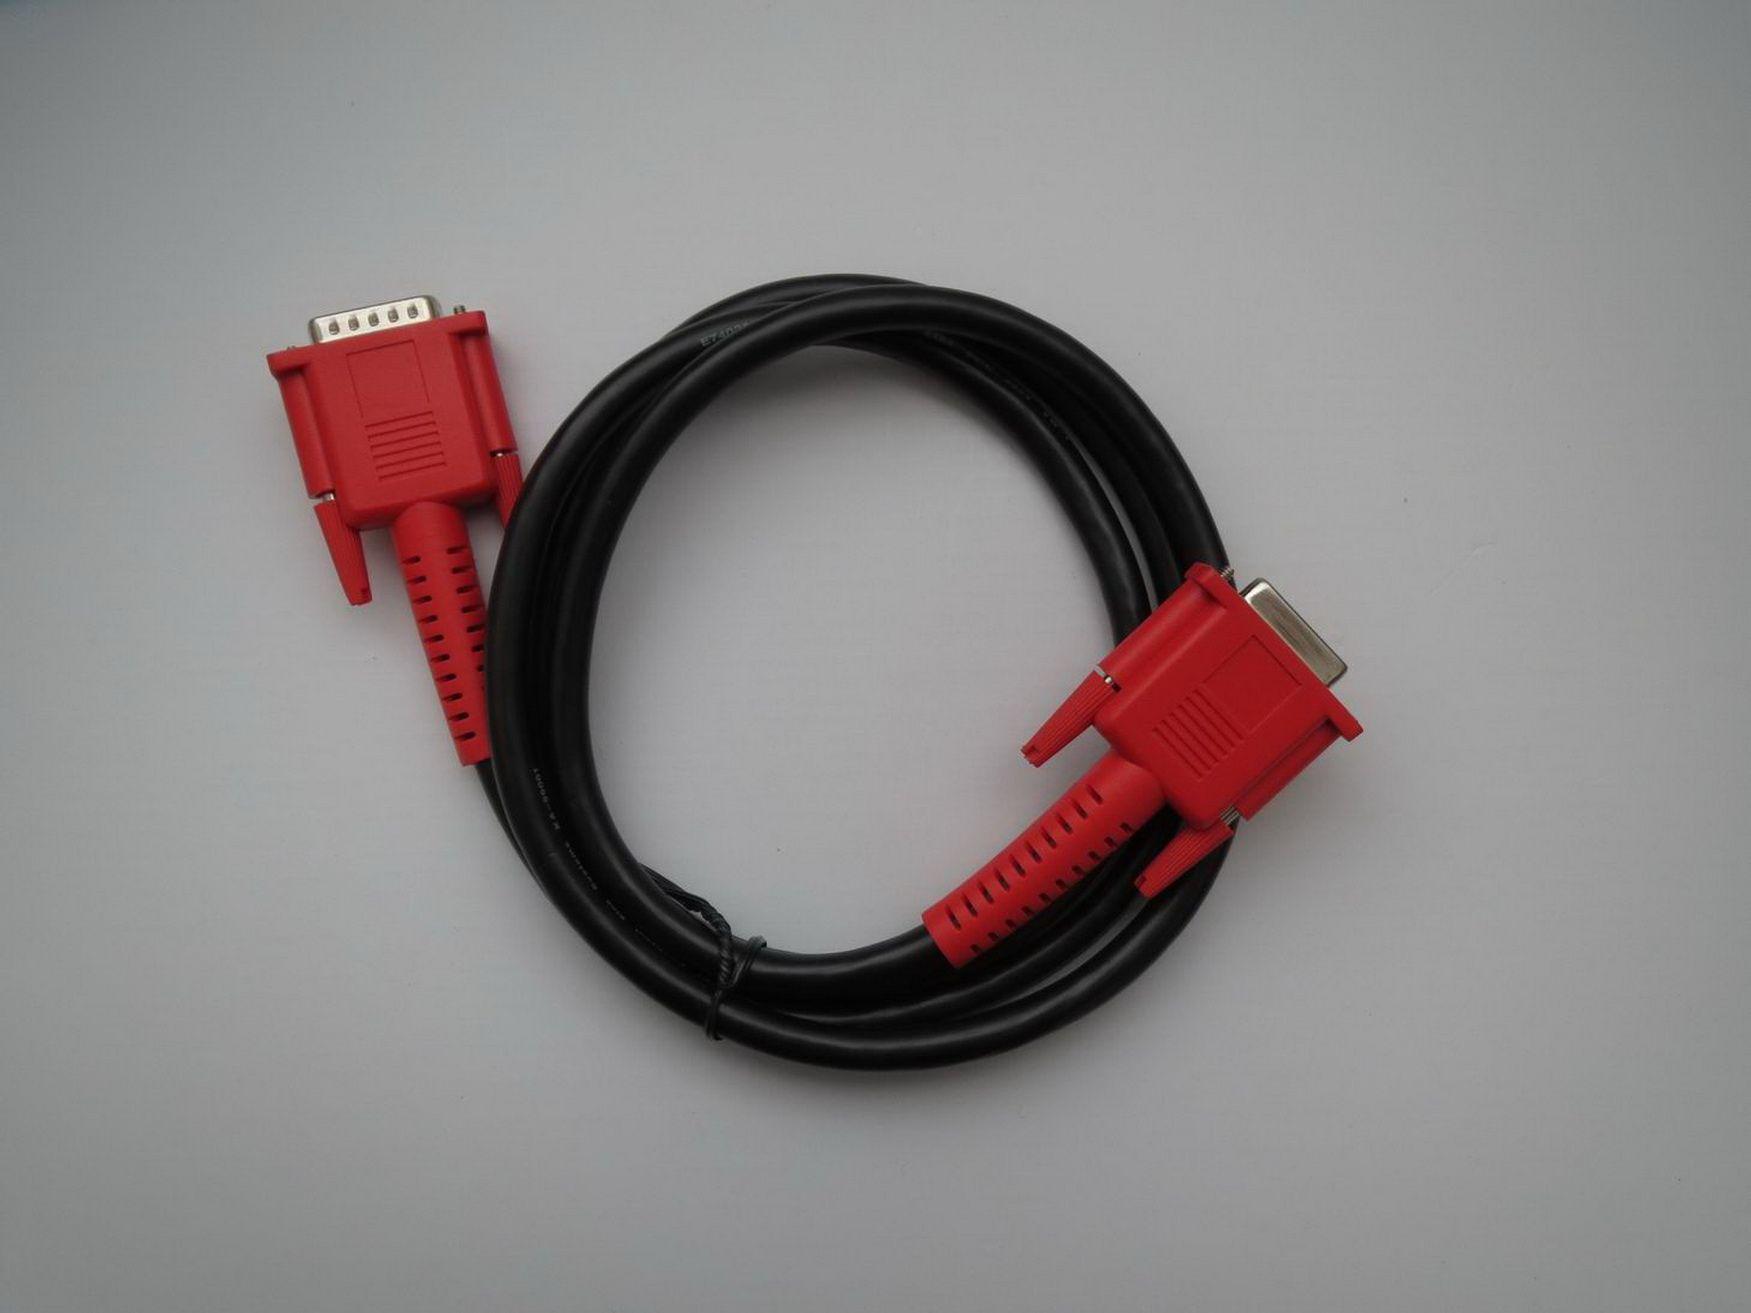 for Autel Maxidas DS708 OBD I II DLC Main Cable 708 Test Cable Autel Diagnostic Tools Cable EOBD Adapters